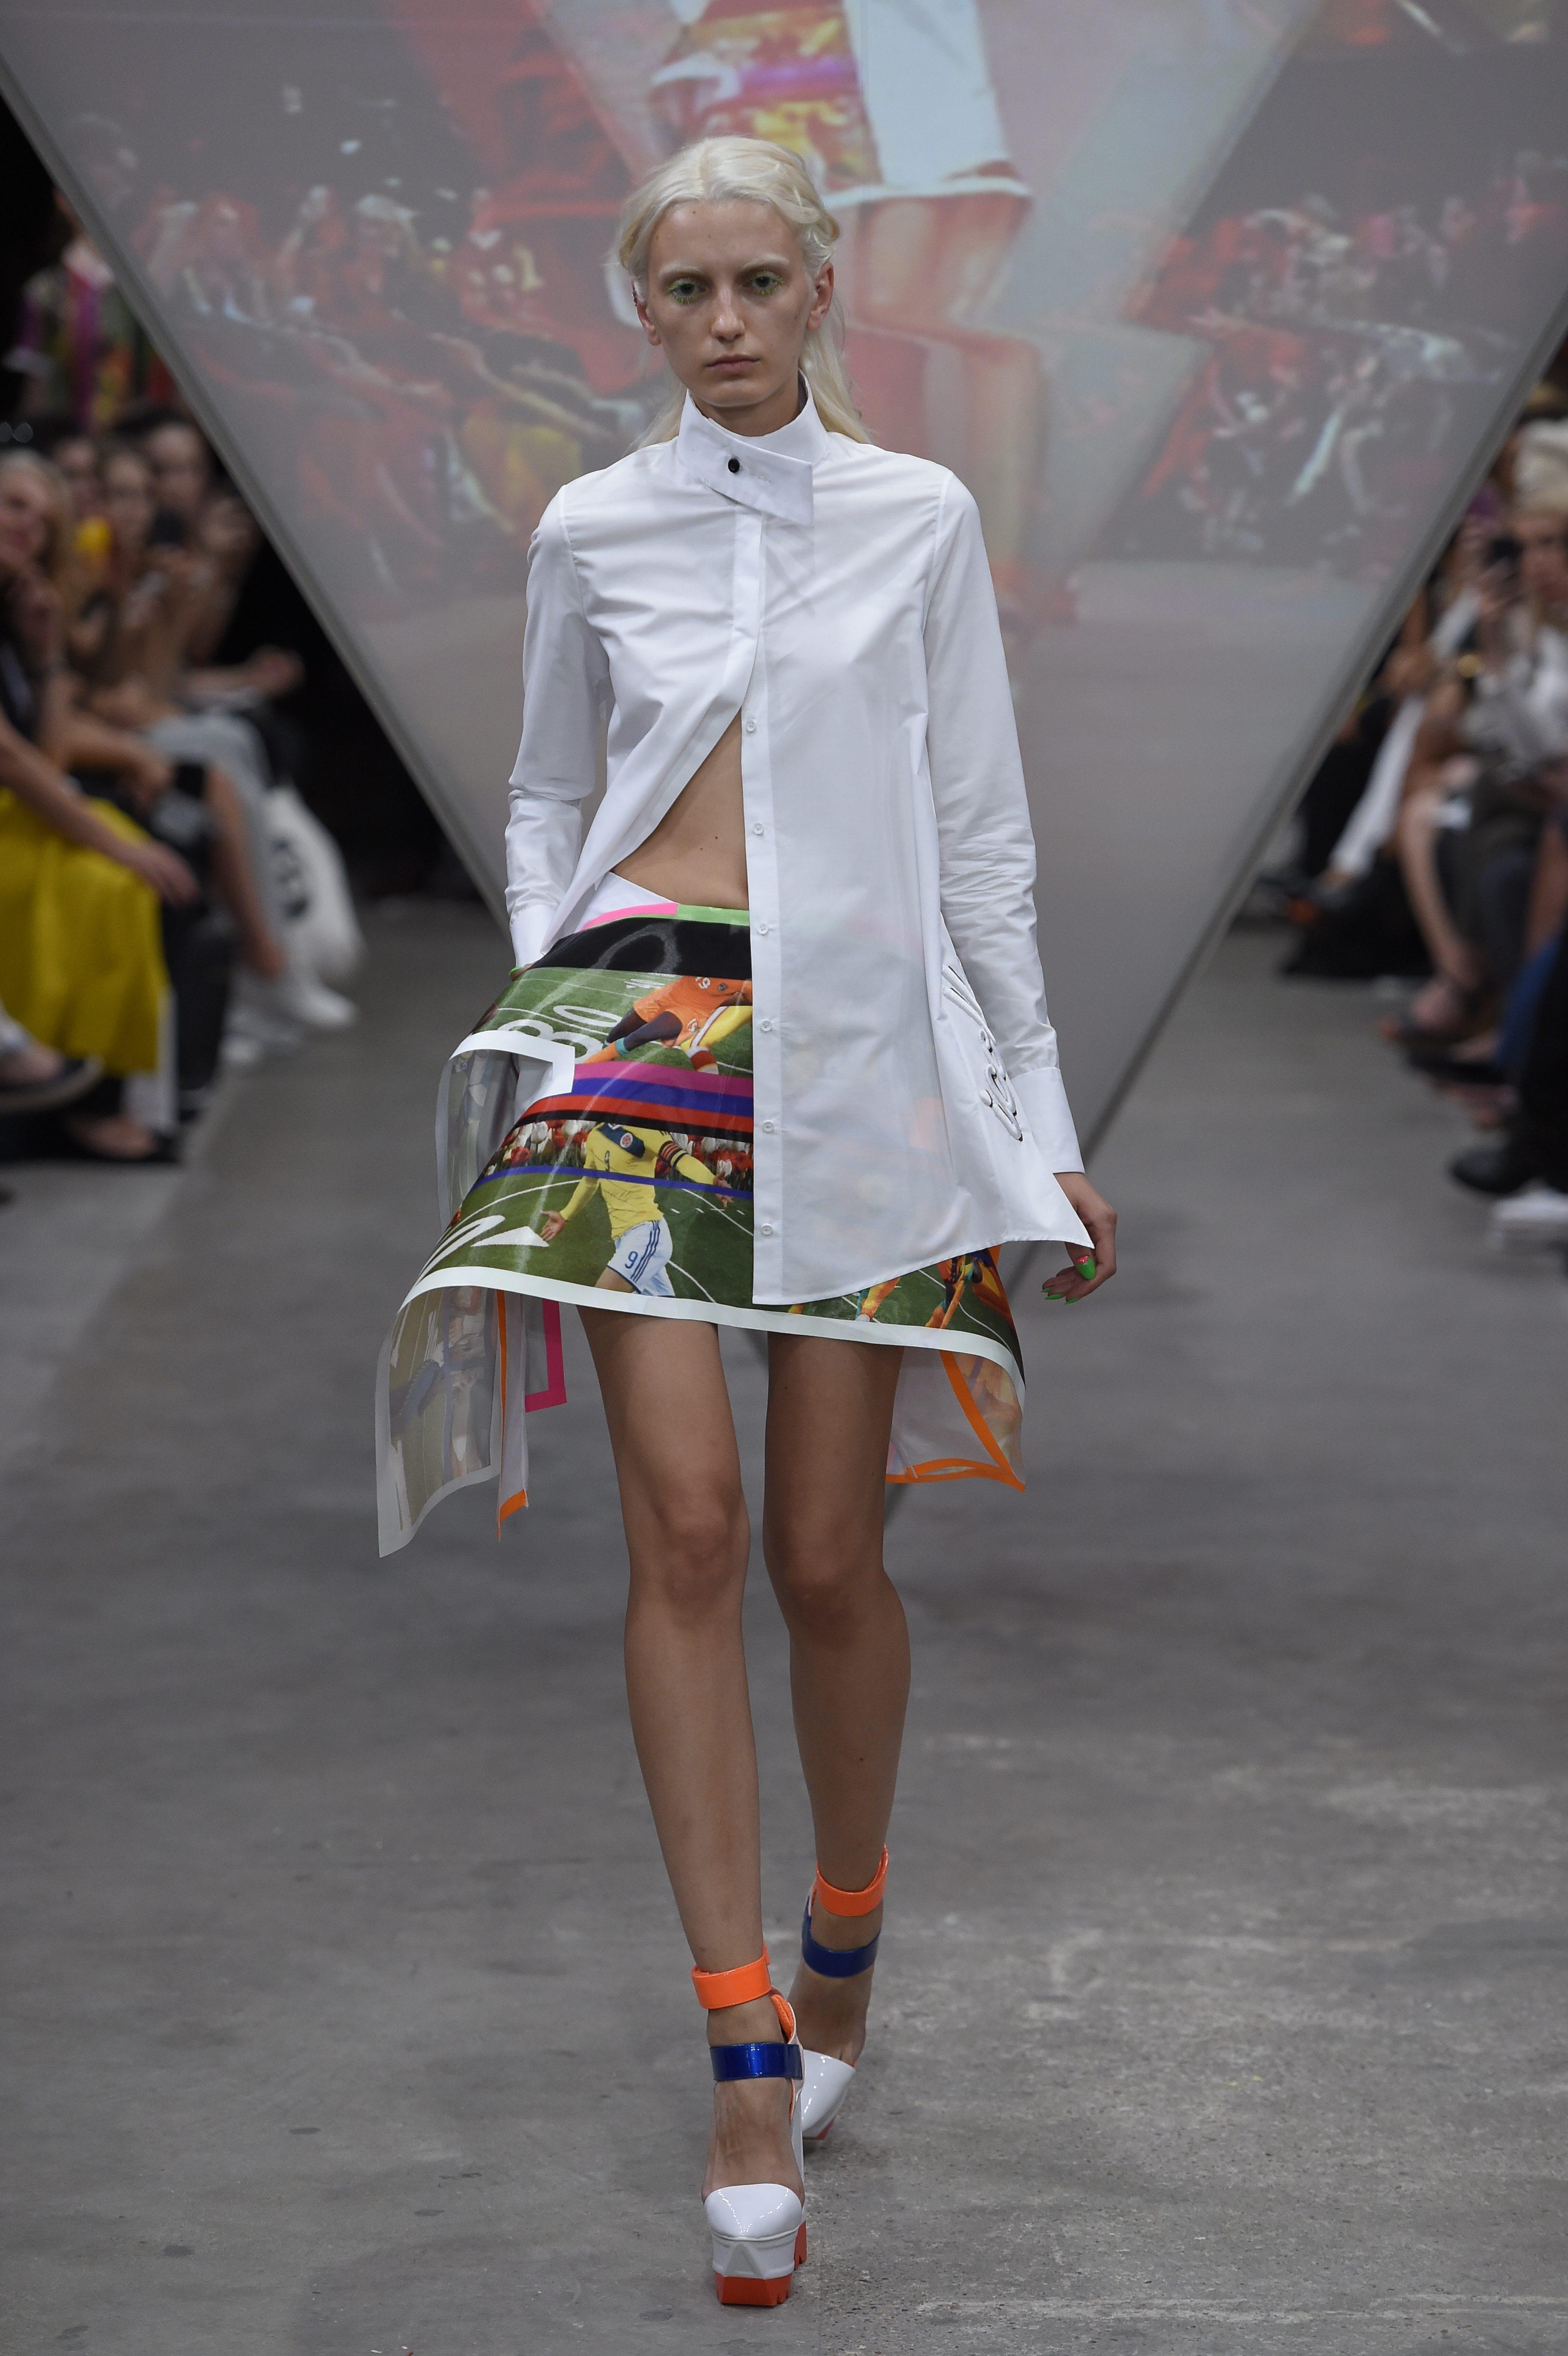 fyodor-golan-creation-mode-futuriste-coloree